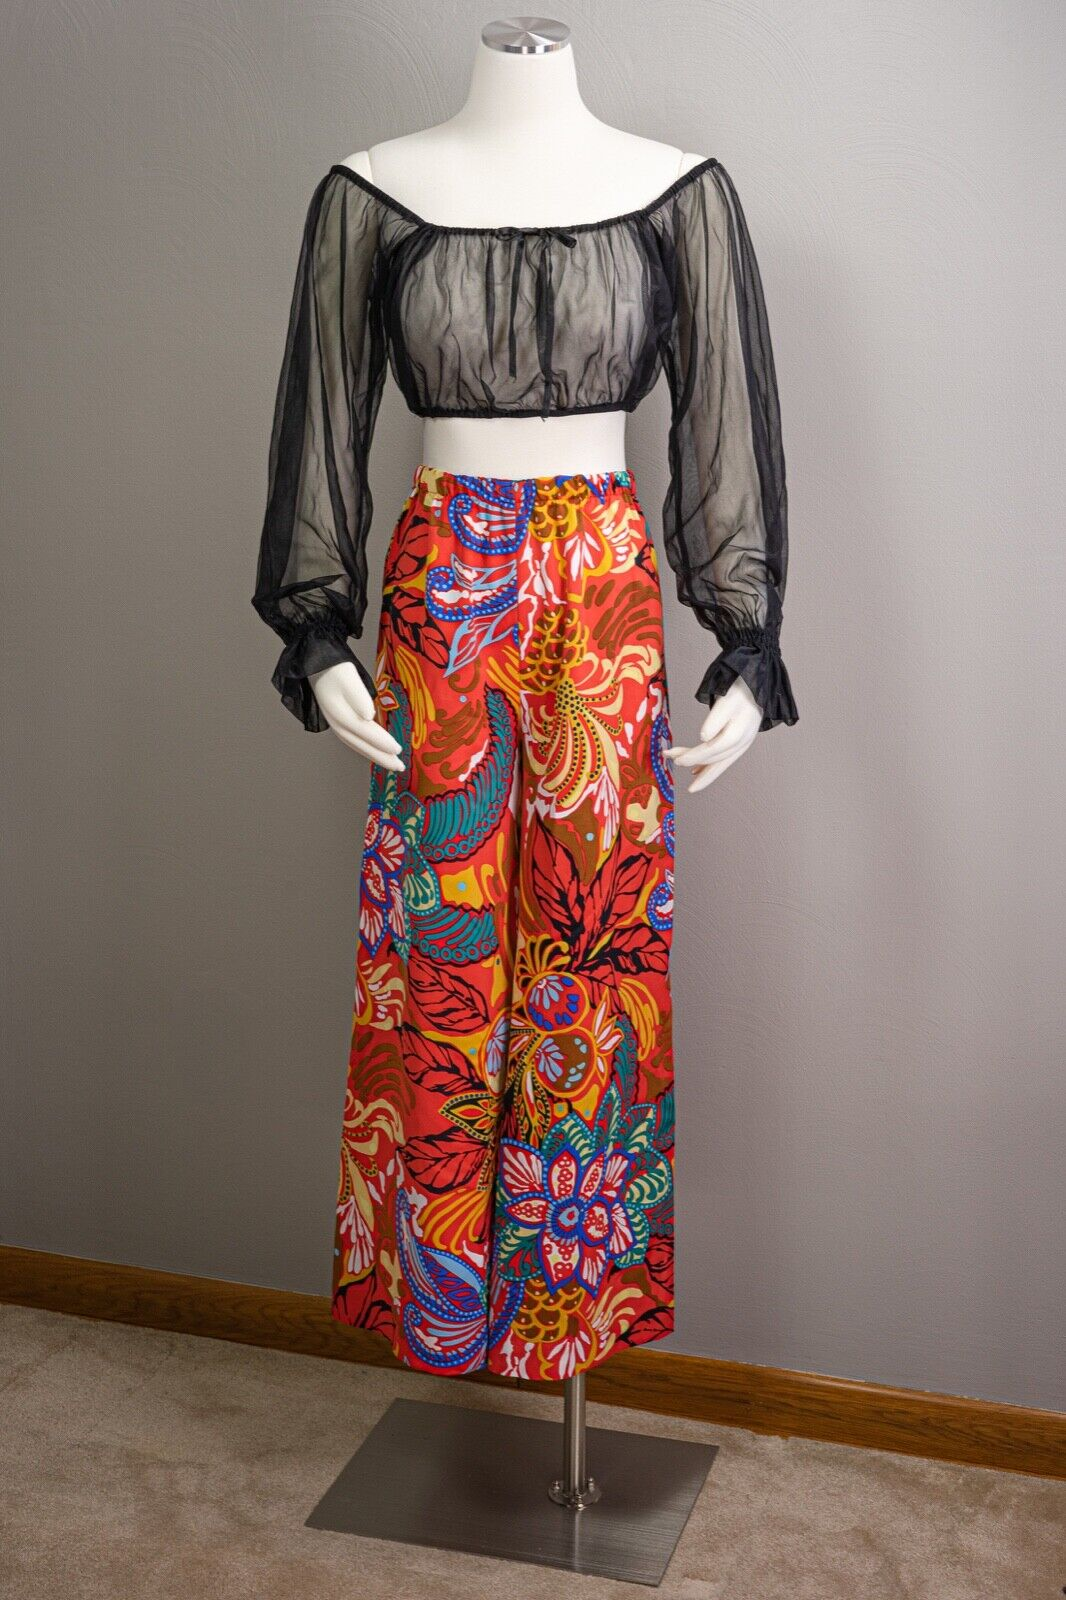 70s Sheer Peasant Crop Top Pants Sets, wide leg p… - image 2